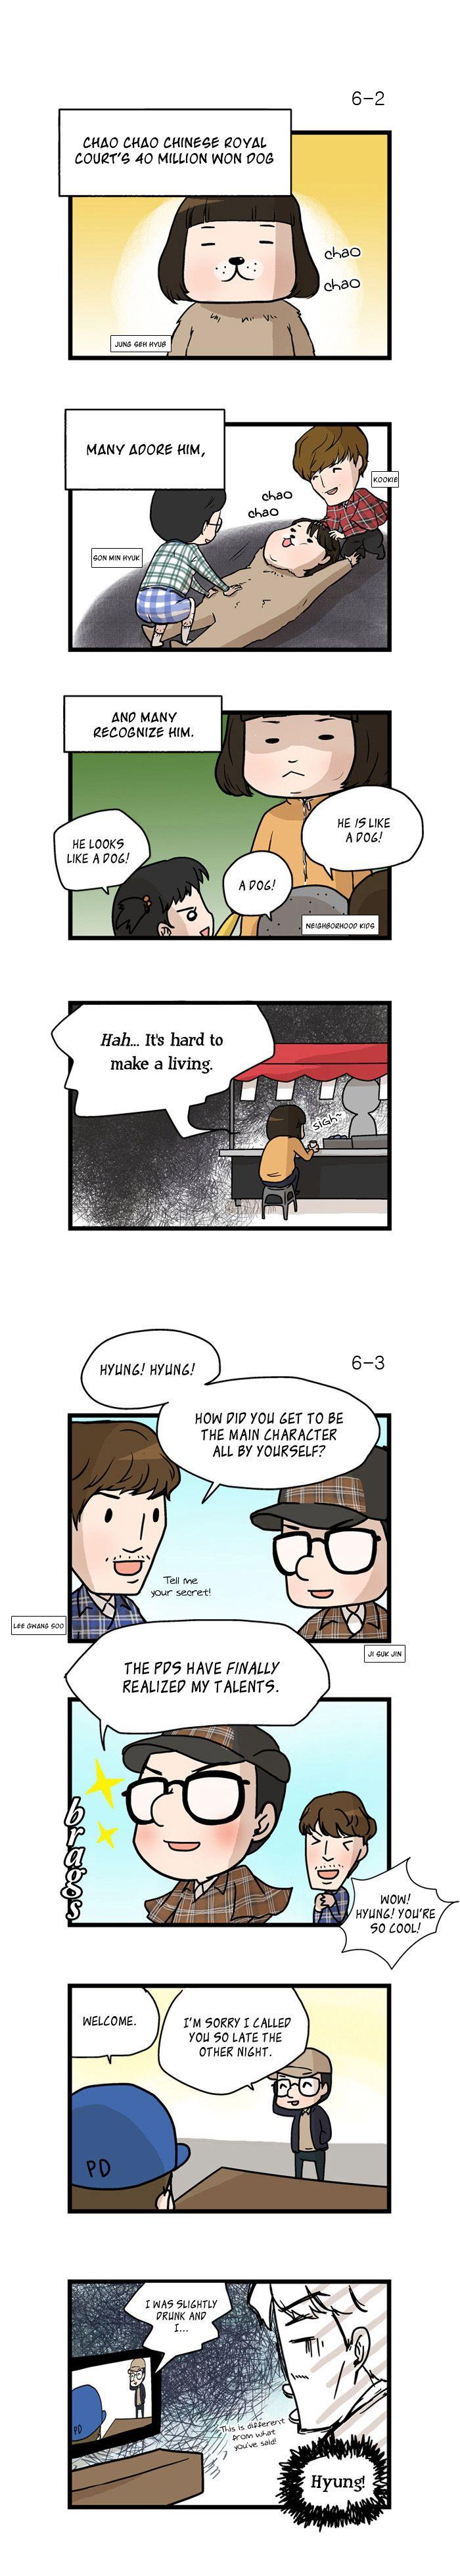 Running Man 6 Page 2